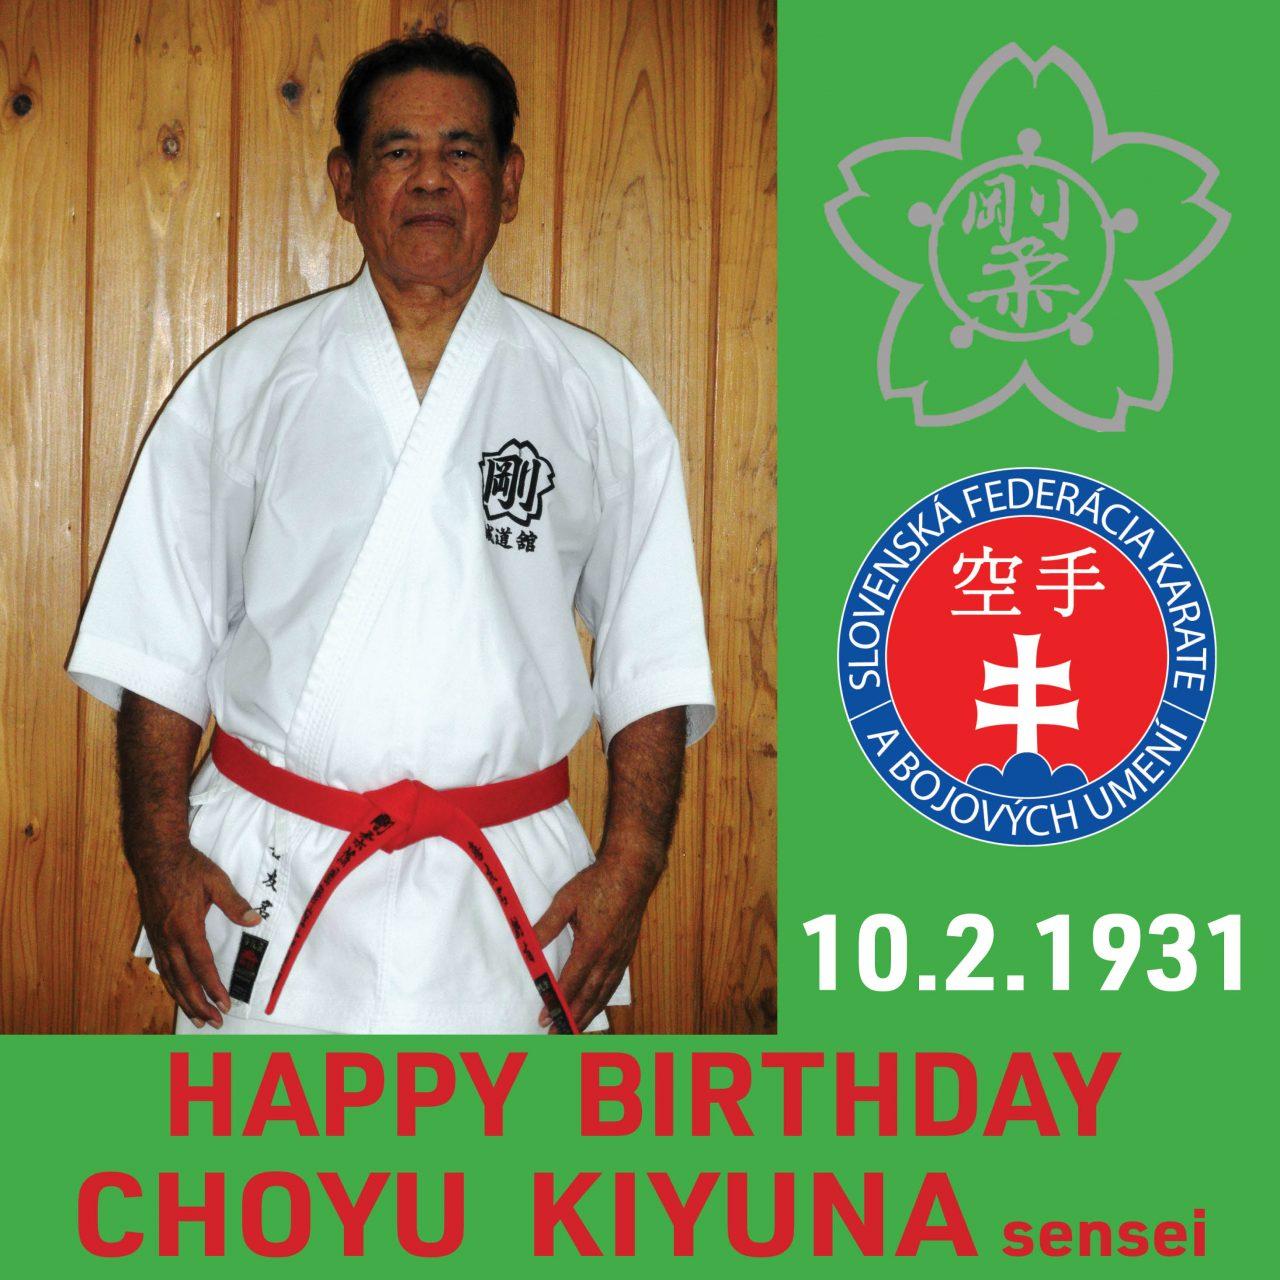 https://karate-slovakia.sk/wp-content/uploads/KIYUNA_SENSEI-1280x1280.jpg